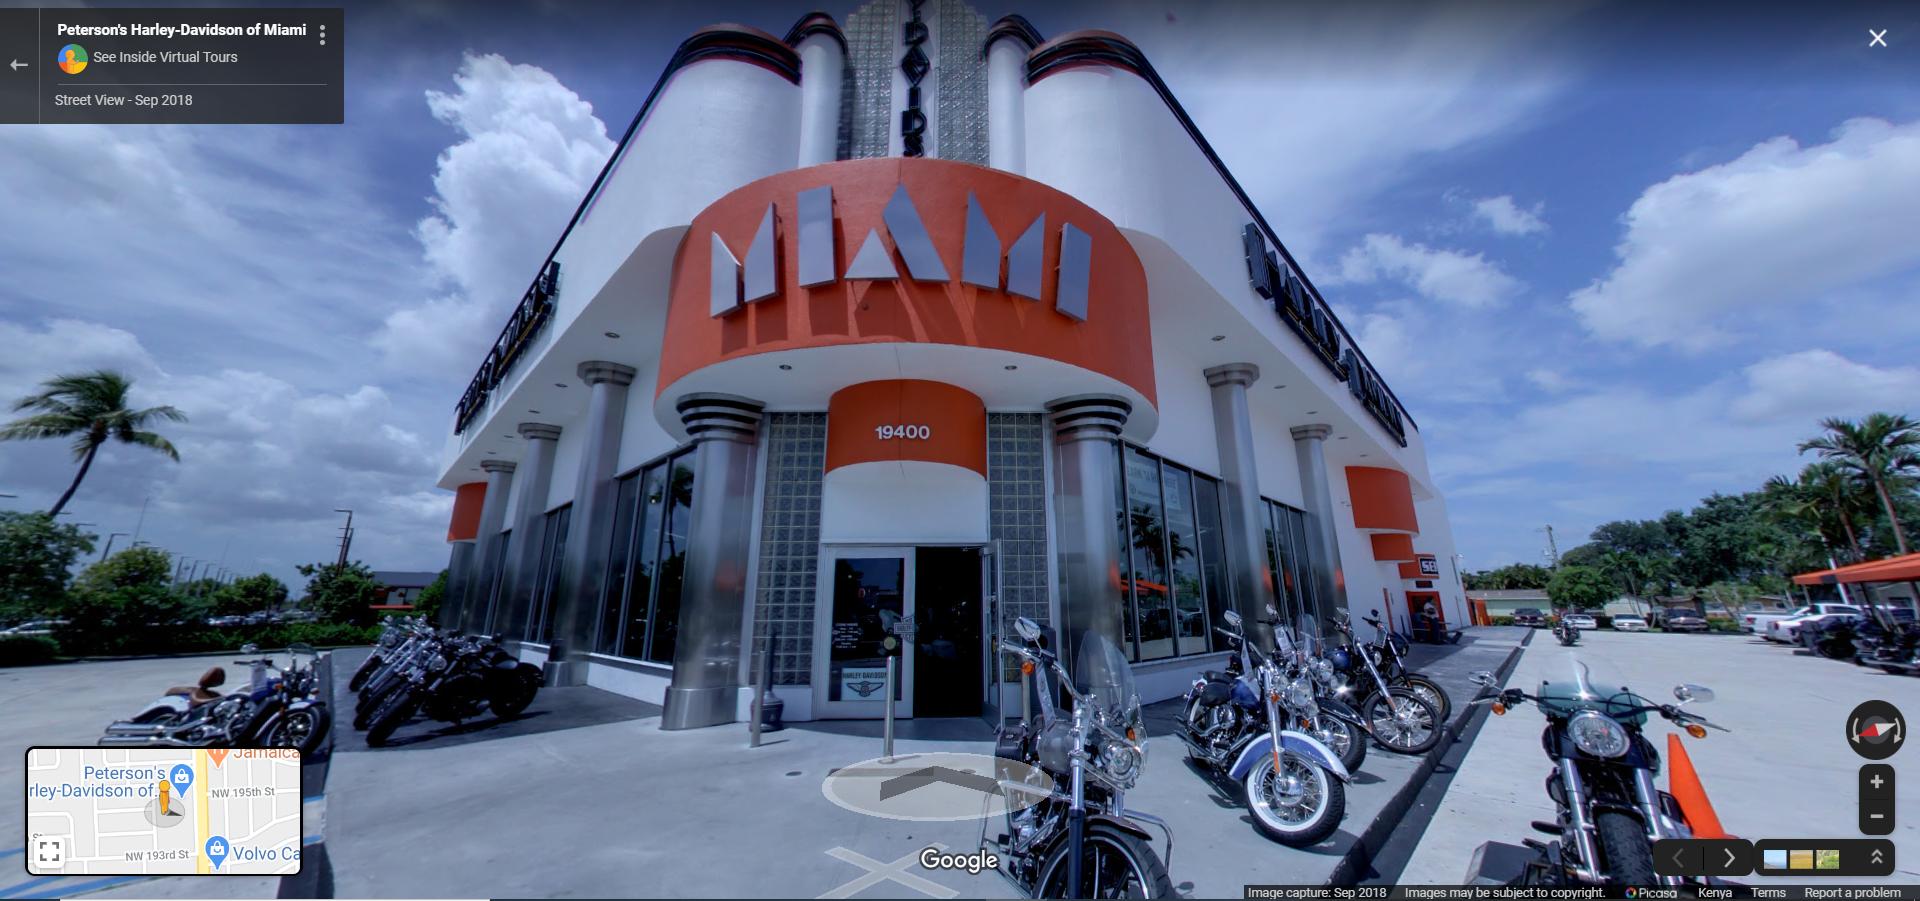 Harley Davidson of North Miami